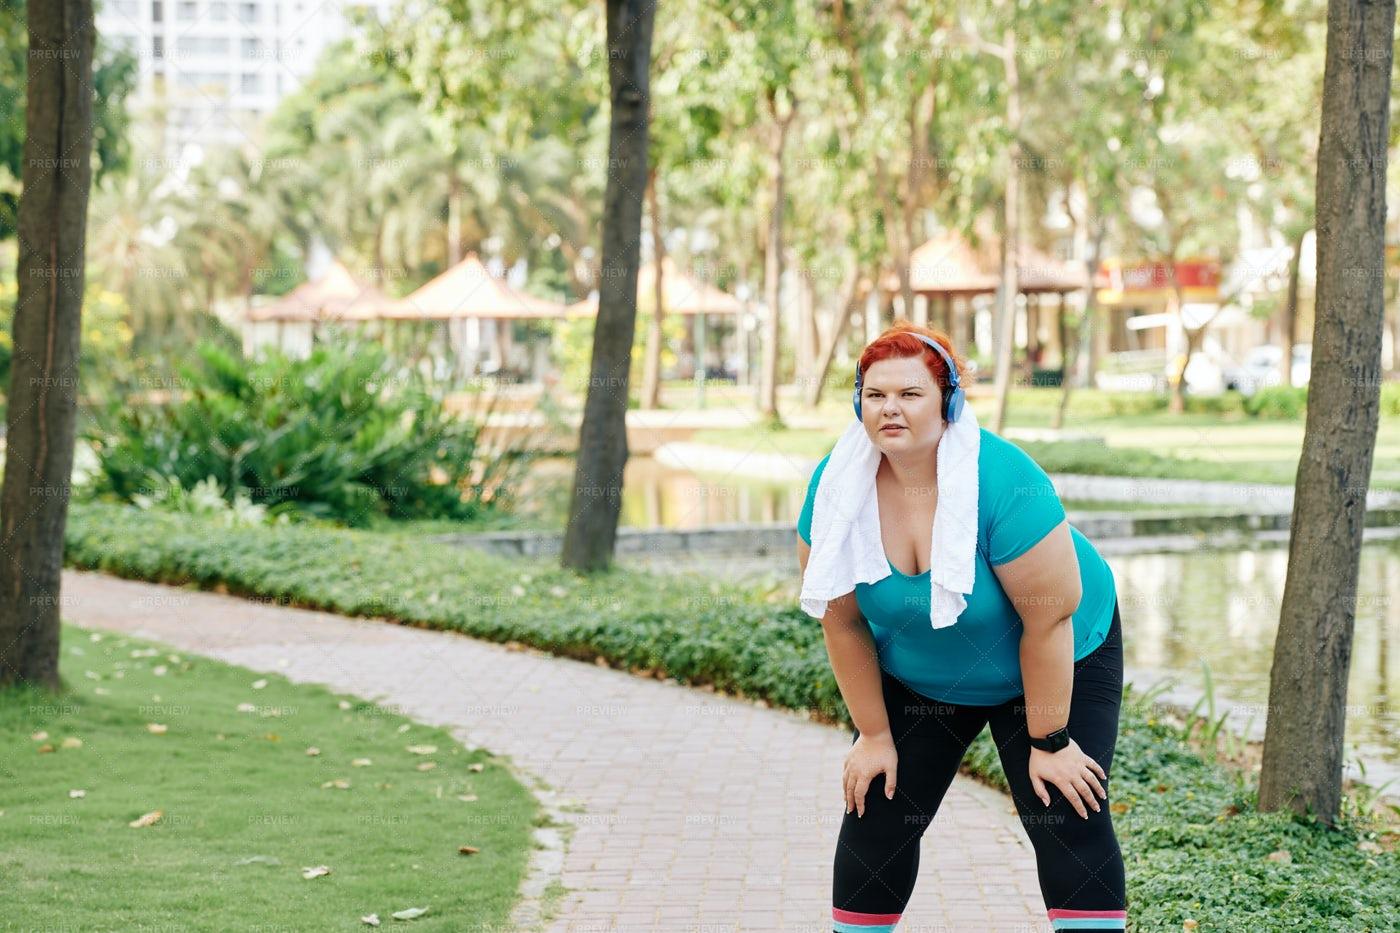 Having A Break After Jogging: Stock Photos